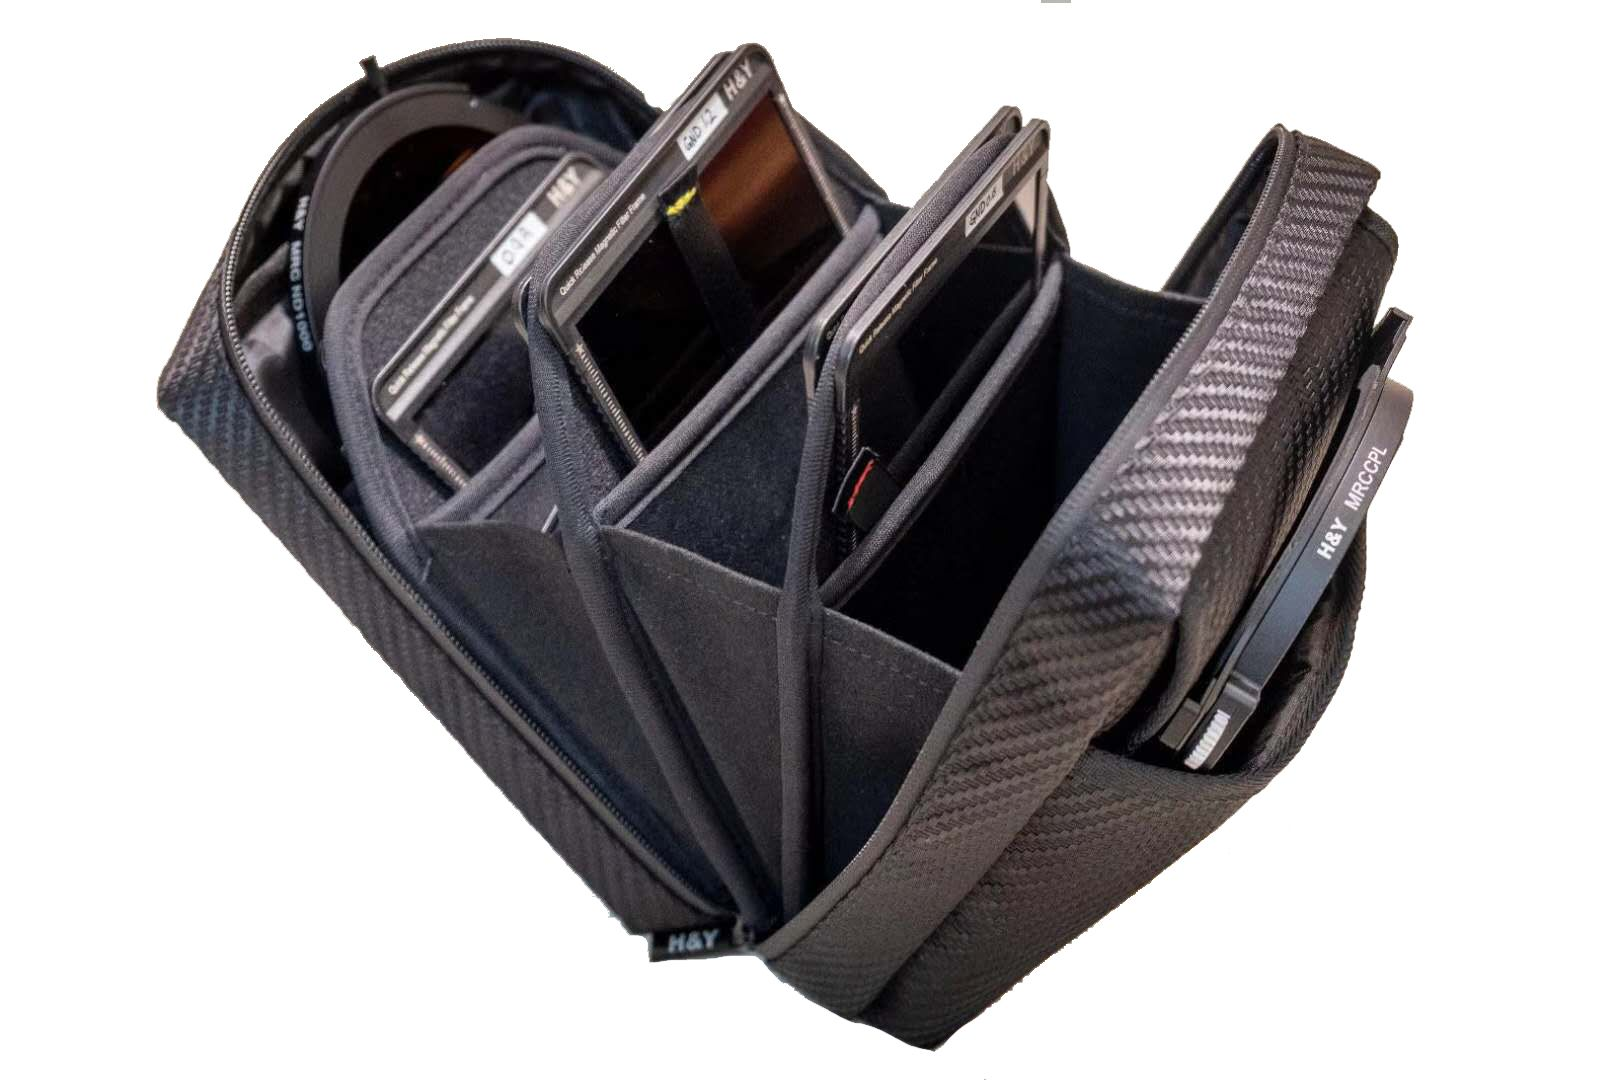 H&Y Luxury Filter Tote Case